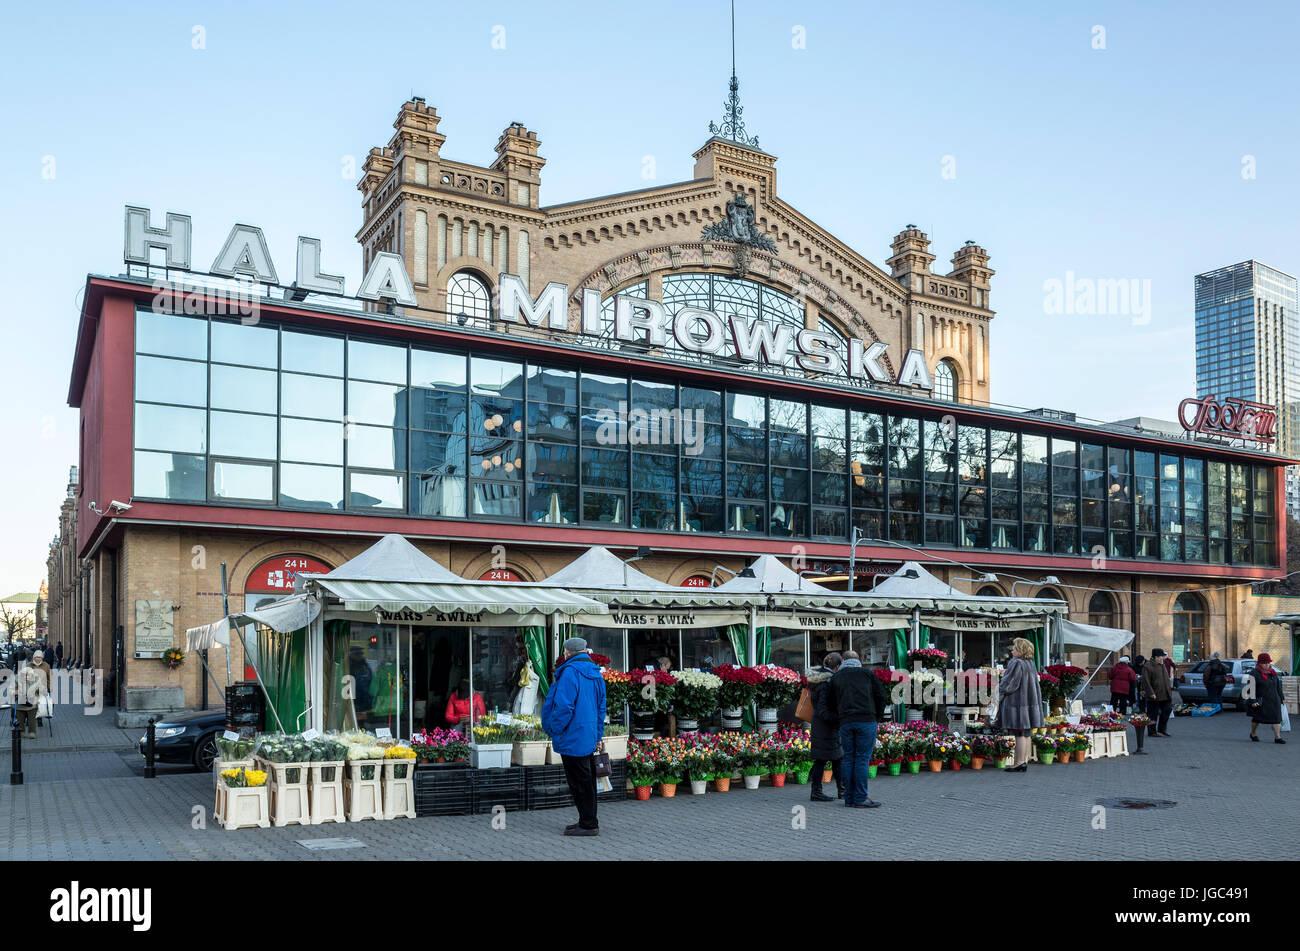 Hale Mirowskie, Warsaw, Poland - Stock Image